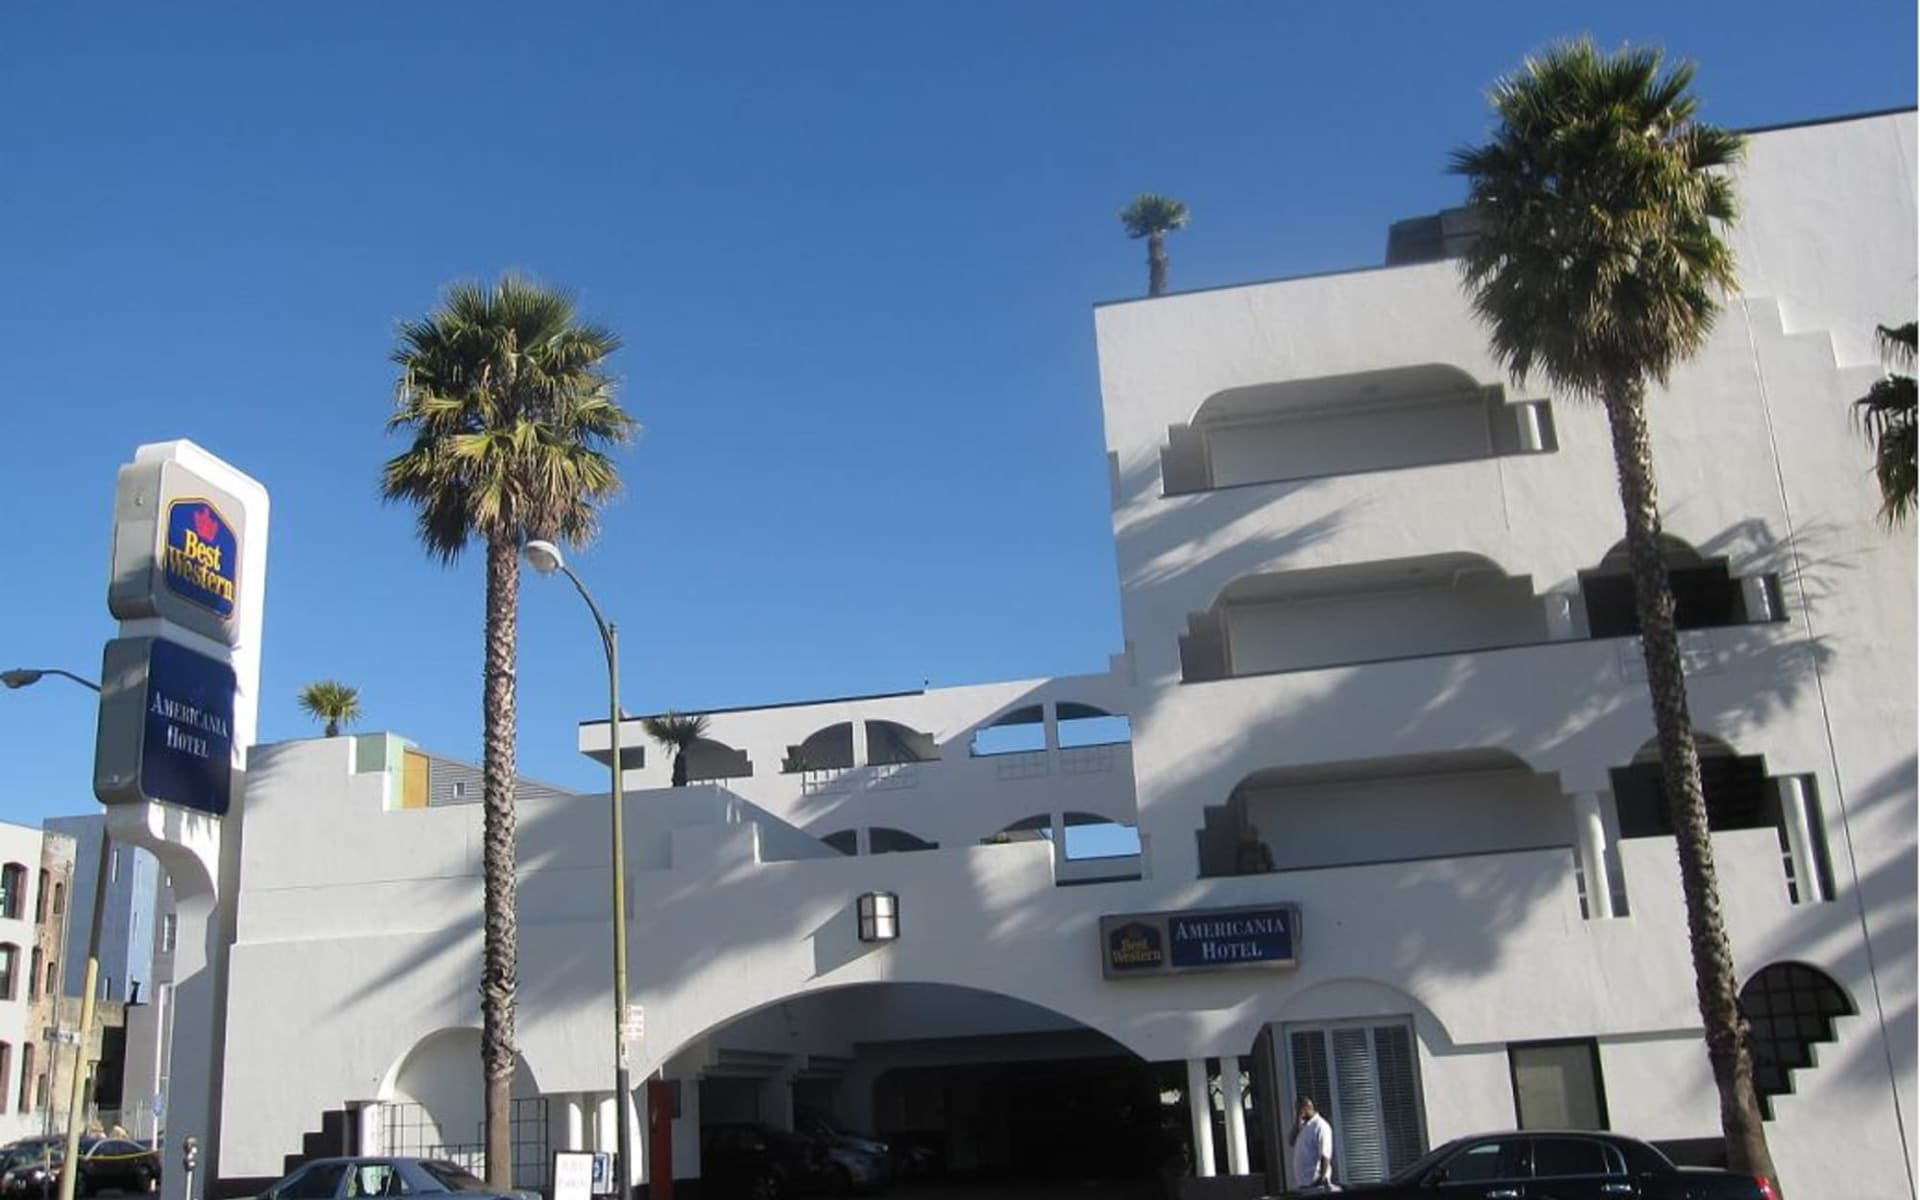 Americania Hotel in San Francisco:  Best Western Americania_Aussenansicht_ATI